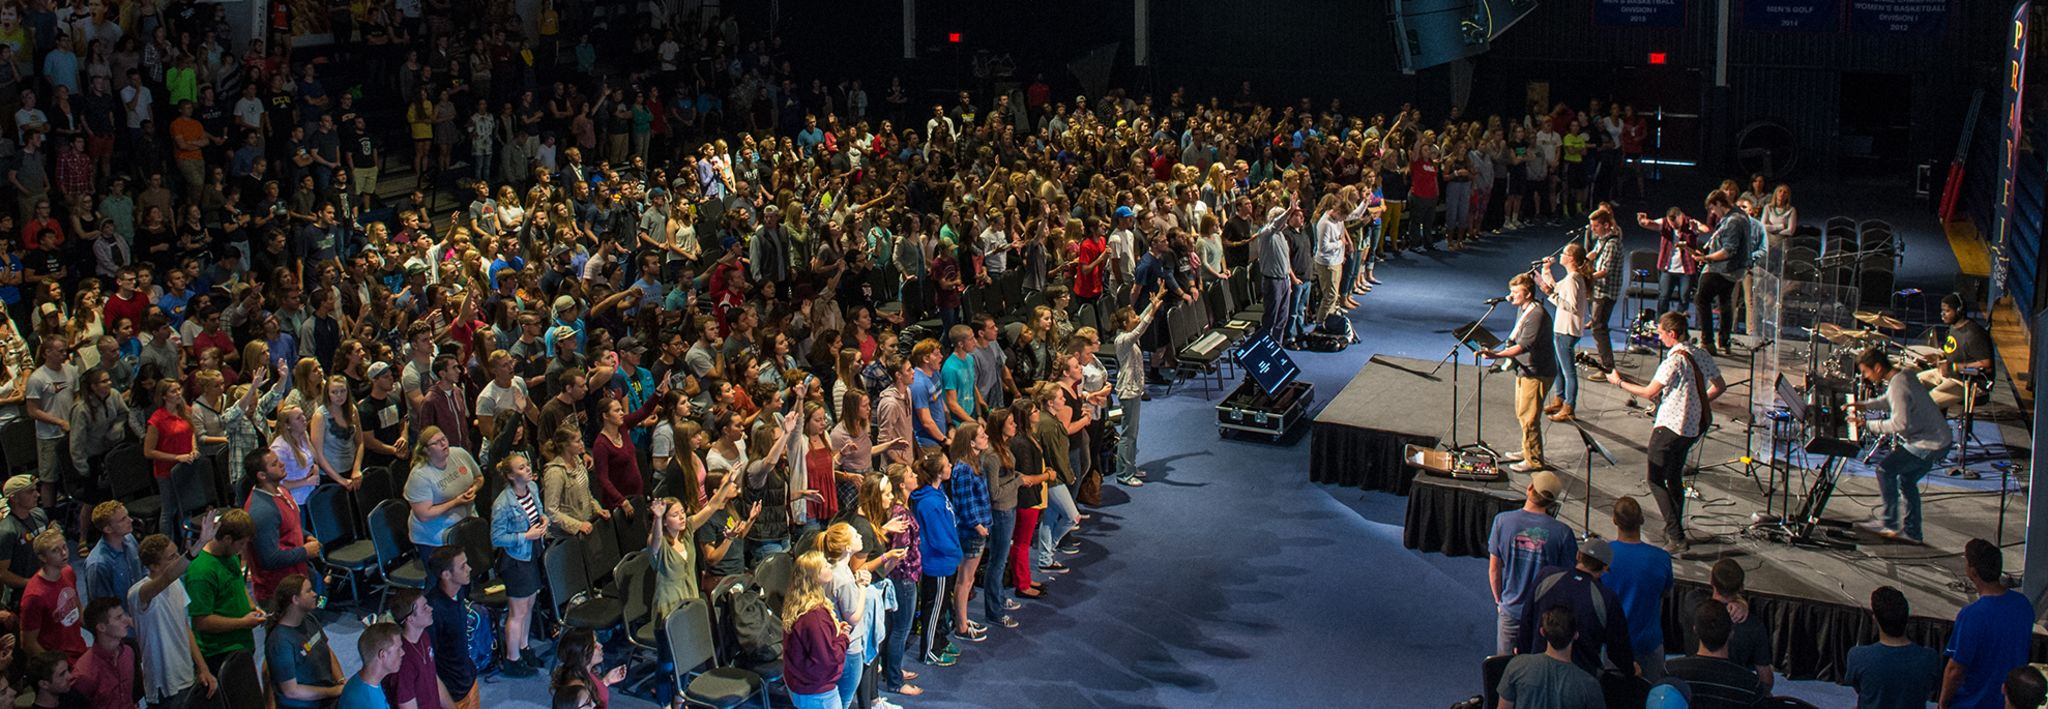 Colorado Christian University students worshiping in chapel.